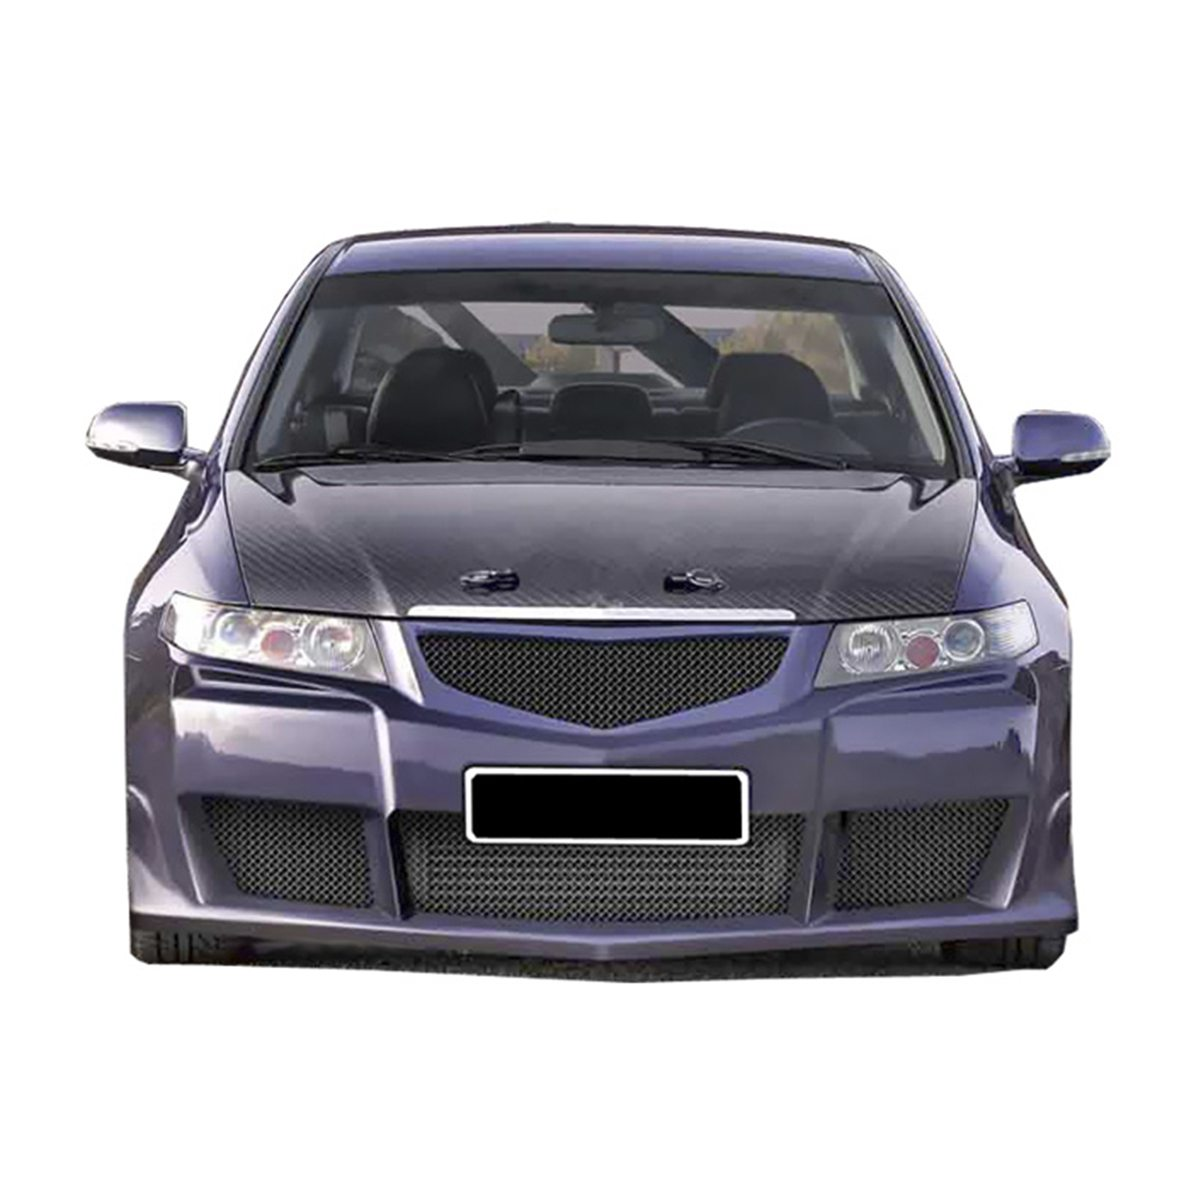 Honda-Accord-2004-Frt-PCS089